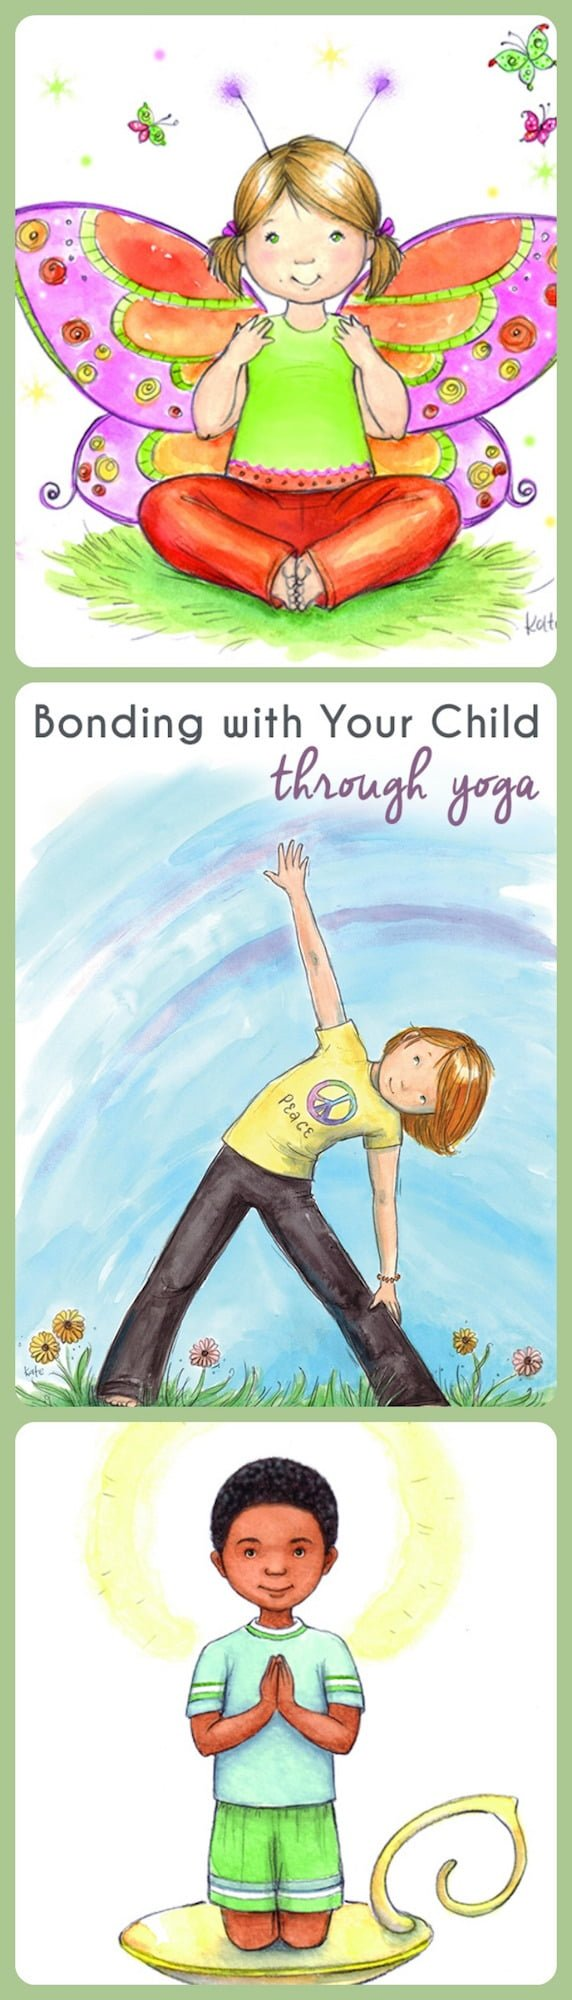 Bonding with your child through yoga